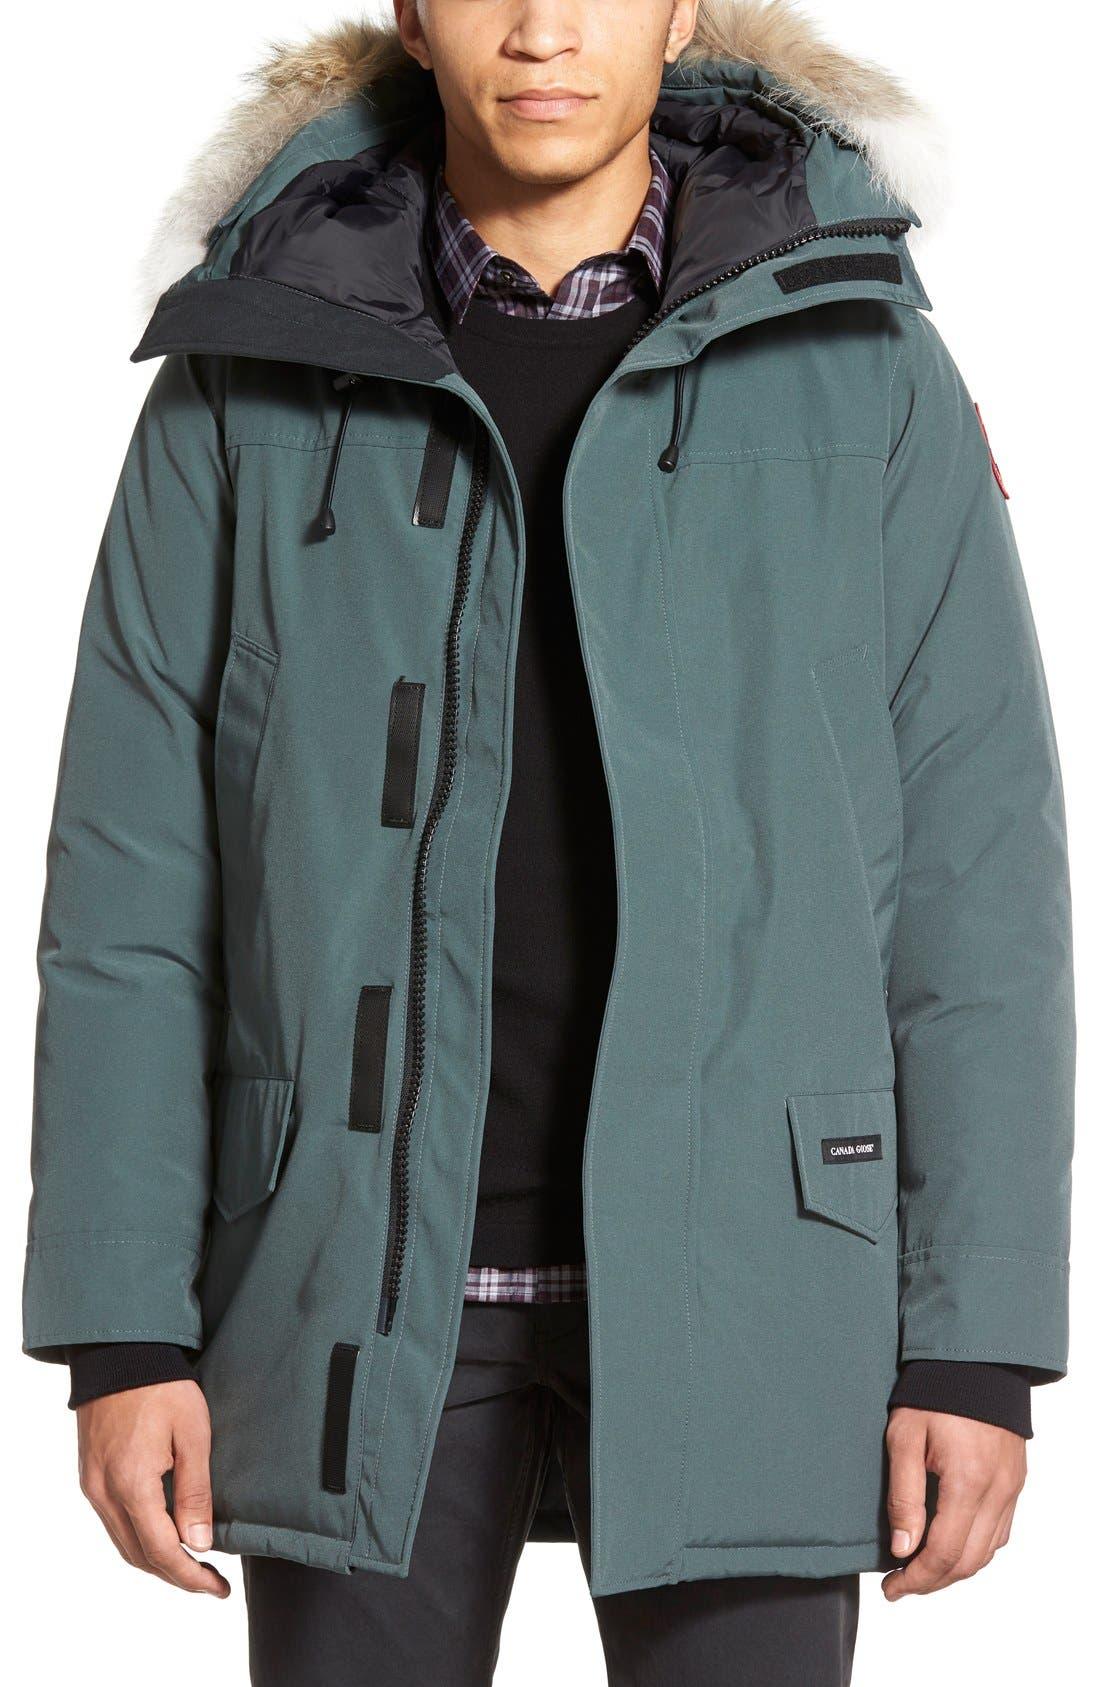 Men's Green Parkas, Jackets & Anoraks | Nordstrom